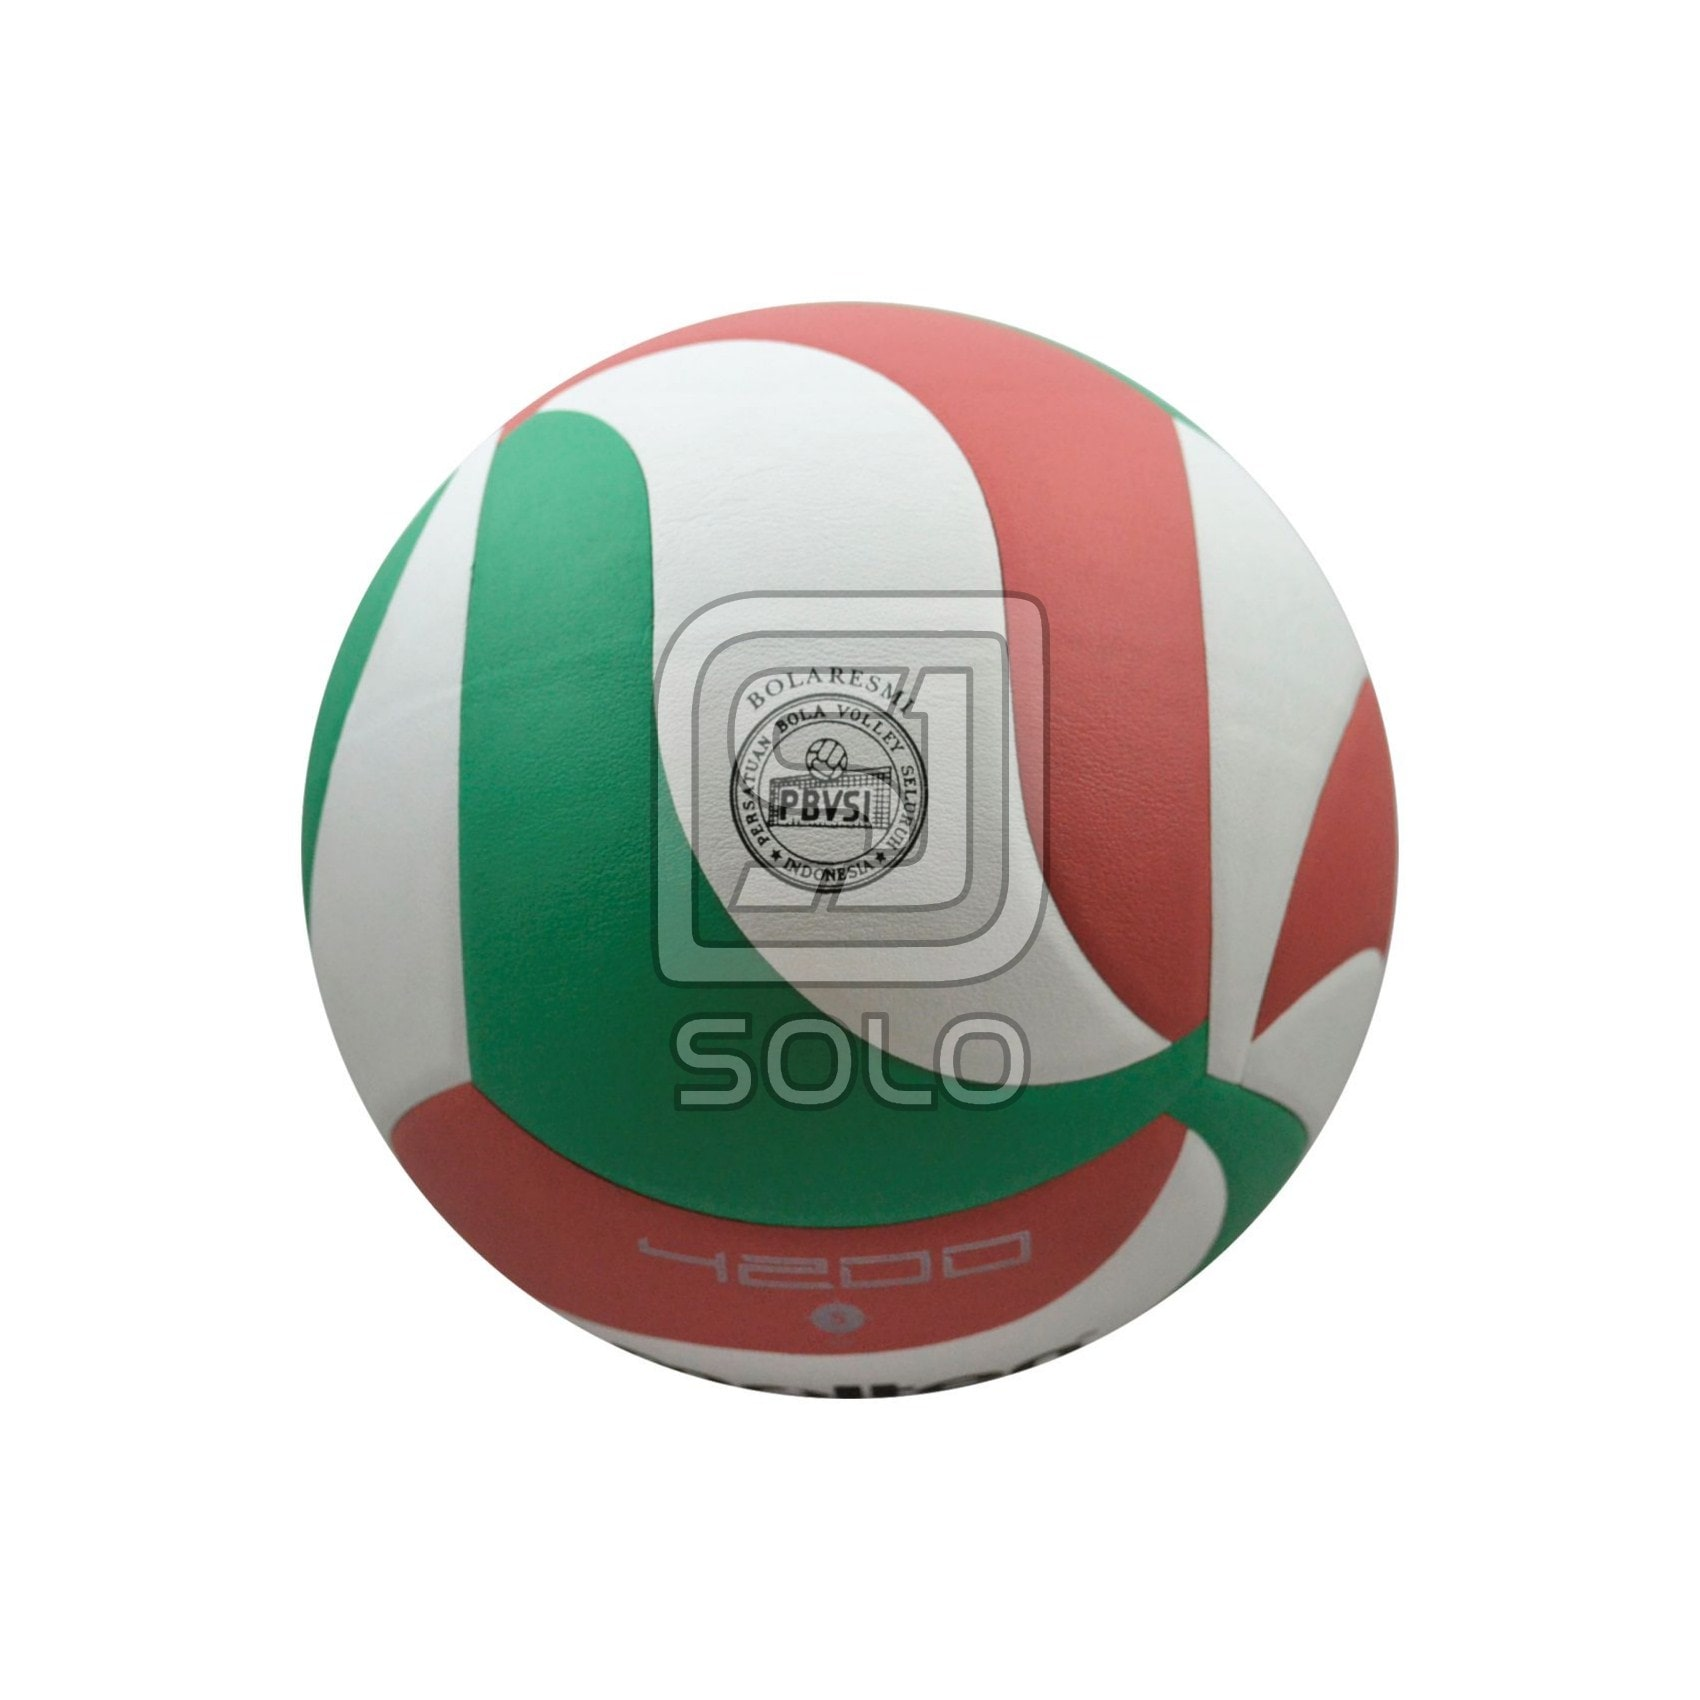 Bola Voli Molten V5m4200 Original Daftar Harga Terbaru Dan Update Volley Volly V5m 4200 Blanjacom